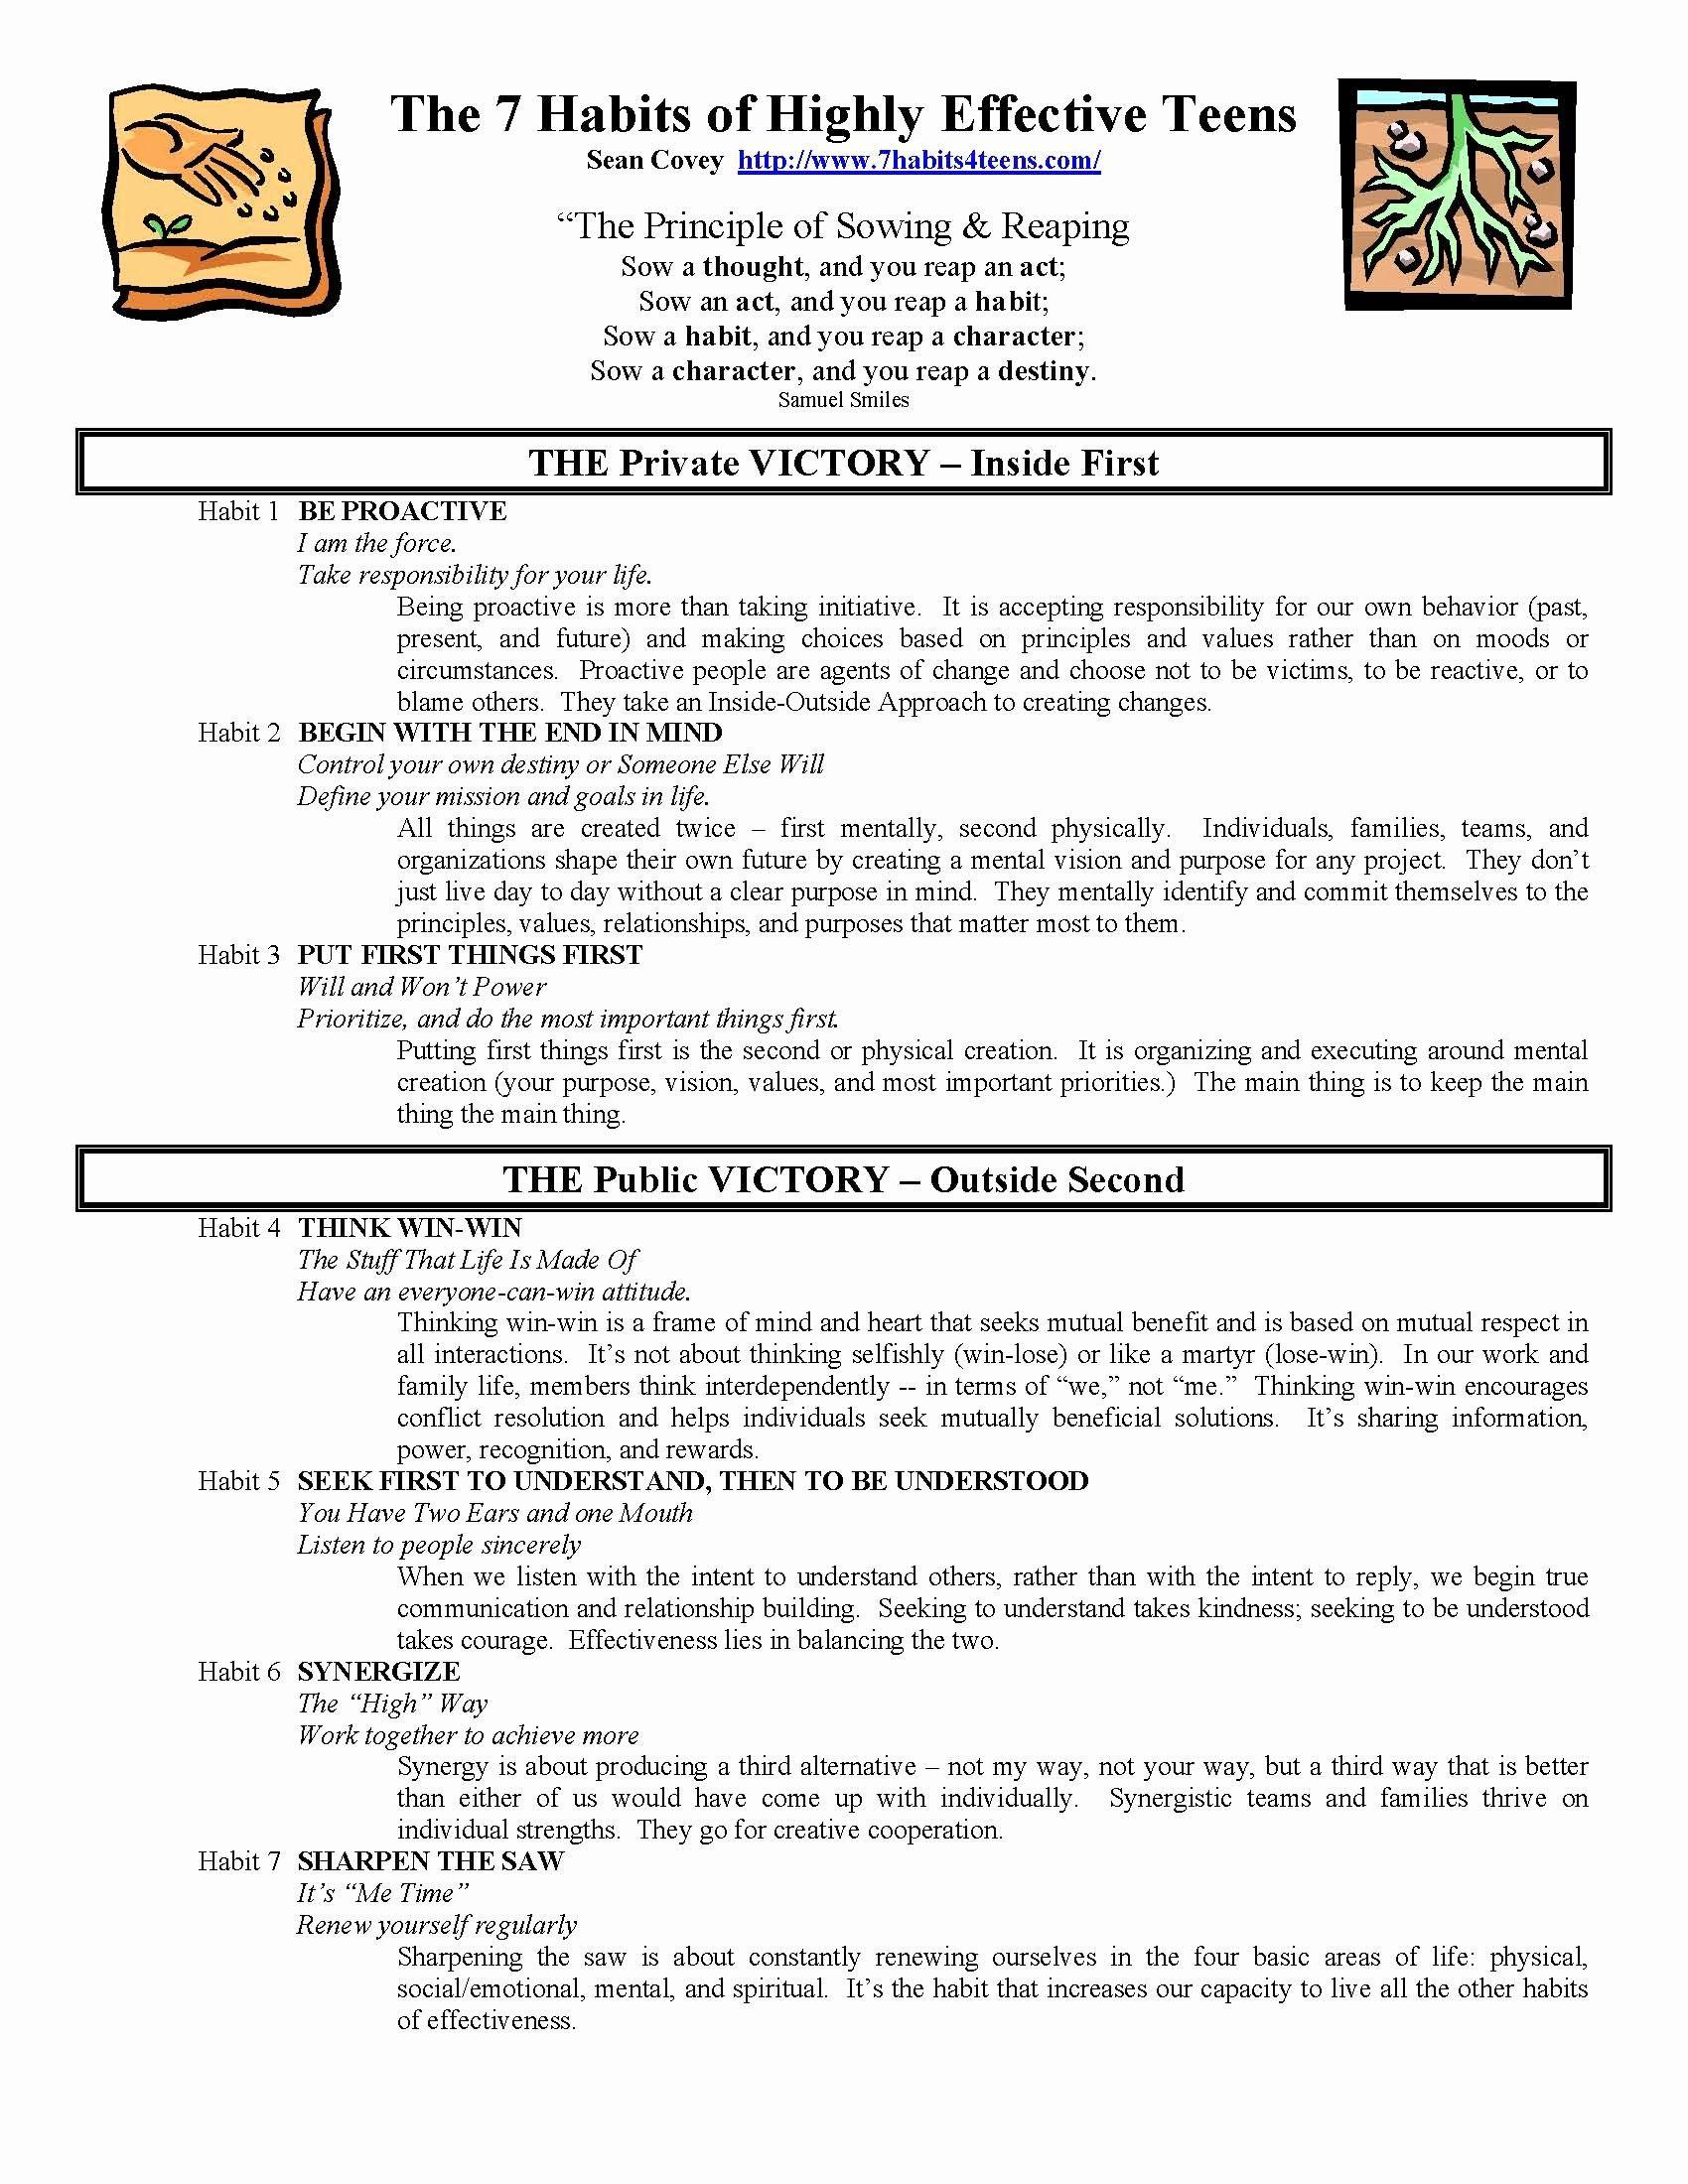 medium resolution of 7 Habits Worksheet Pdf Luxury 7 Habits Highly Effective Teens Worksheets  the Best   School organization for teens